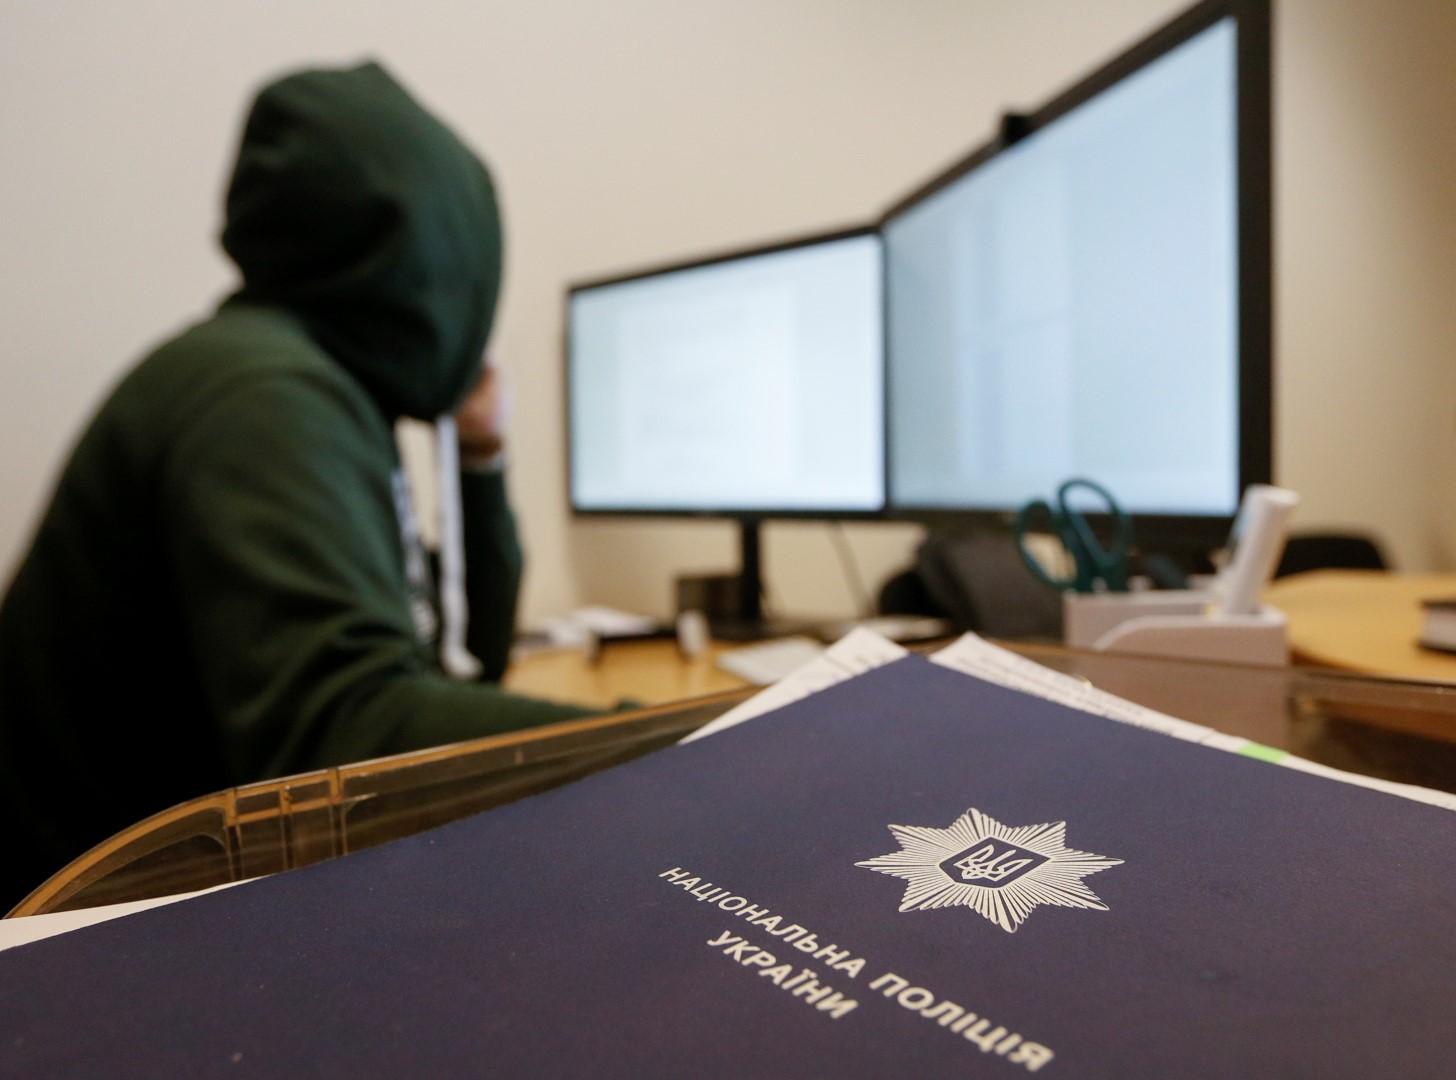 An employee works at the Ukrainian Cyber Police headquarters in Kiev, Ukraine November 2, 2017.  REUTERS/Valentyn Ogirenko - RC1449D41F70